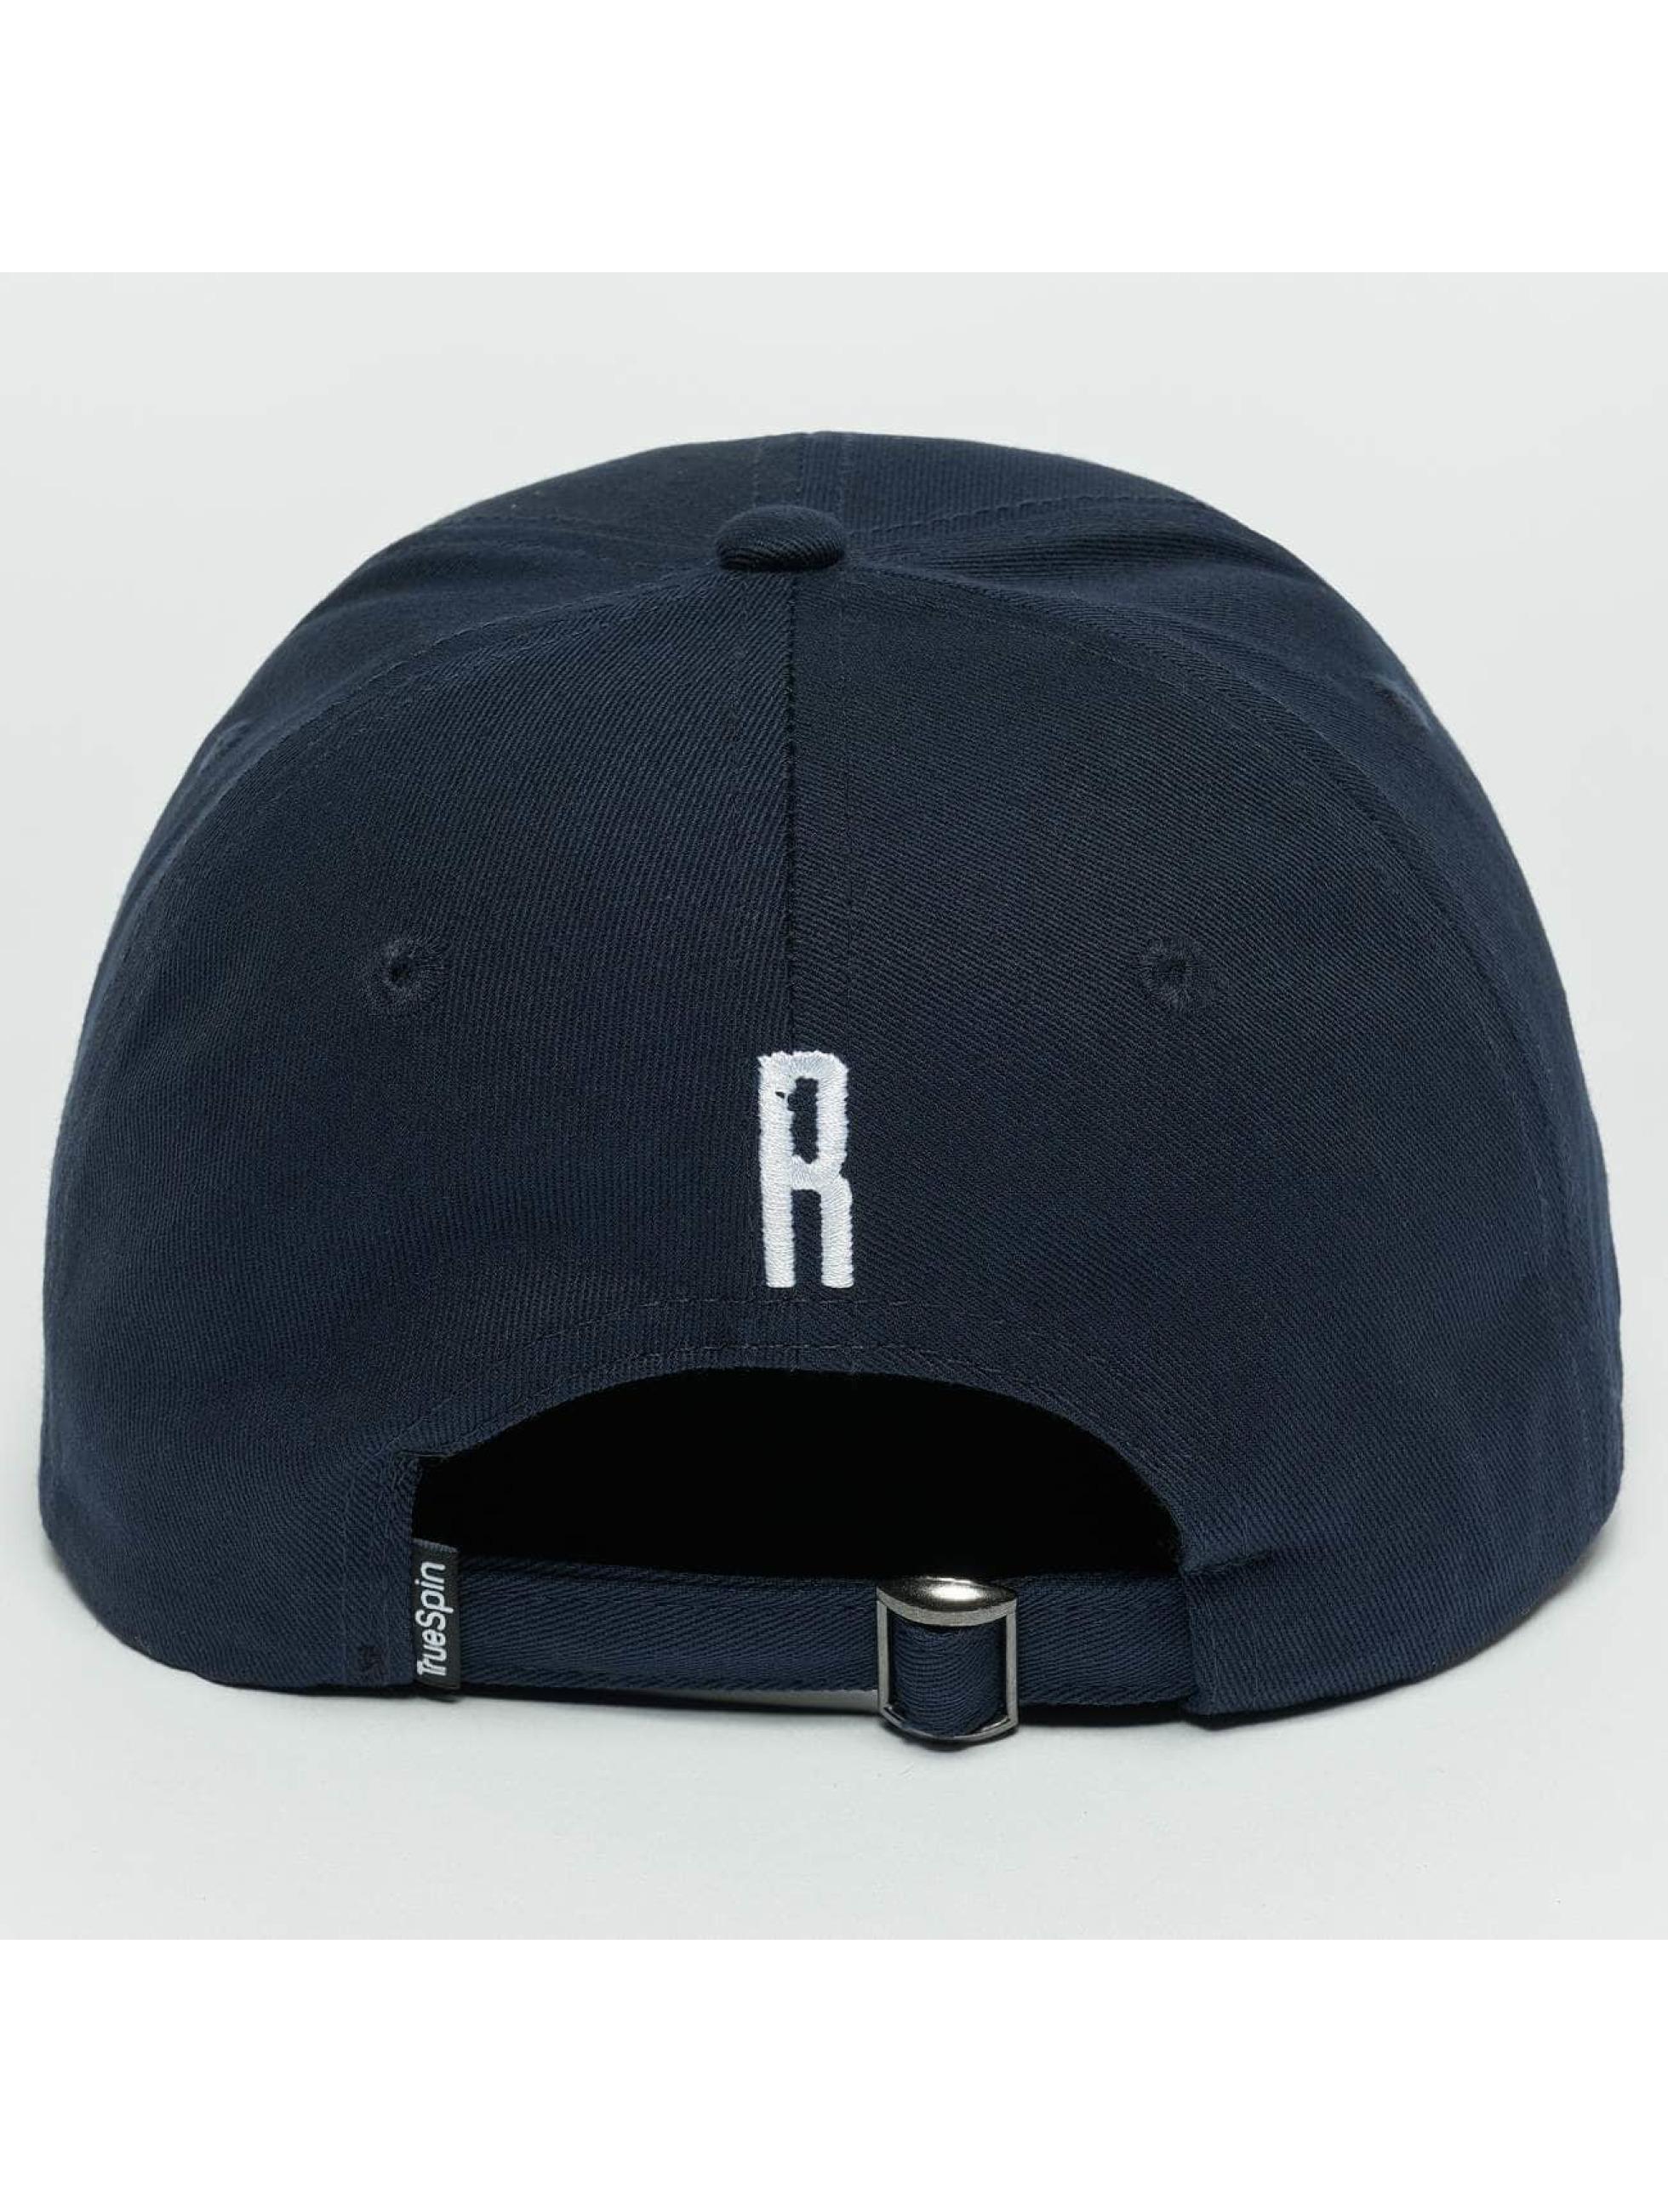 TrueSpin Casquette Snapback & Strapback ABC R bleu